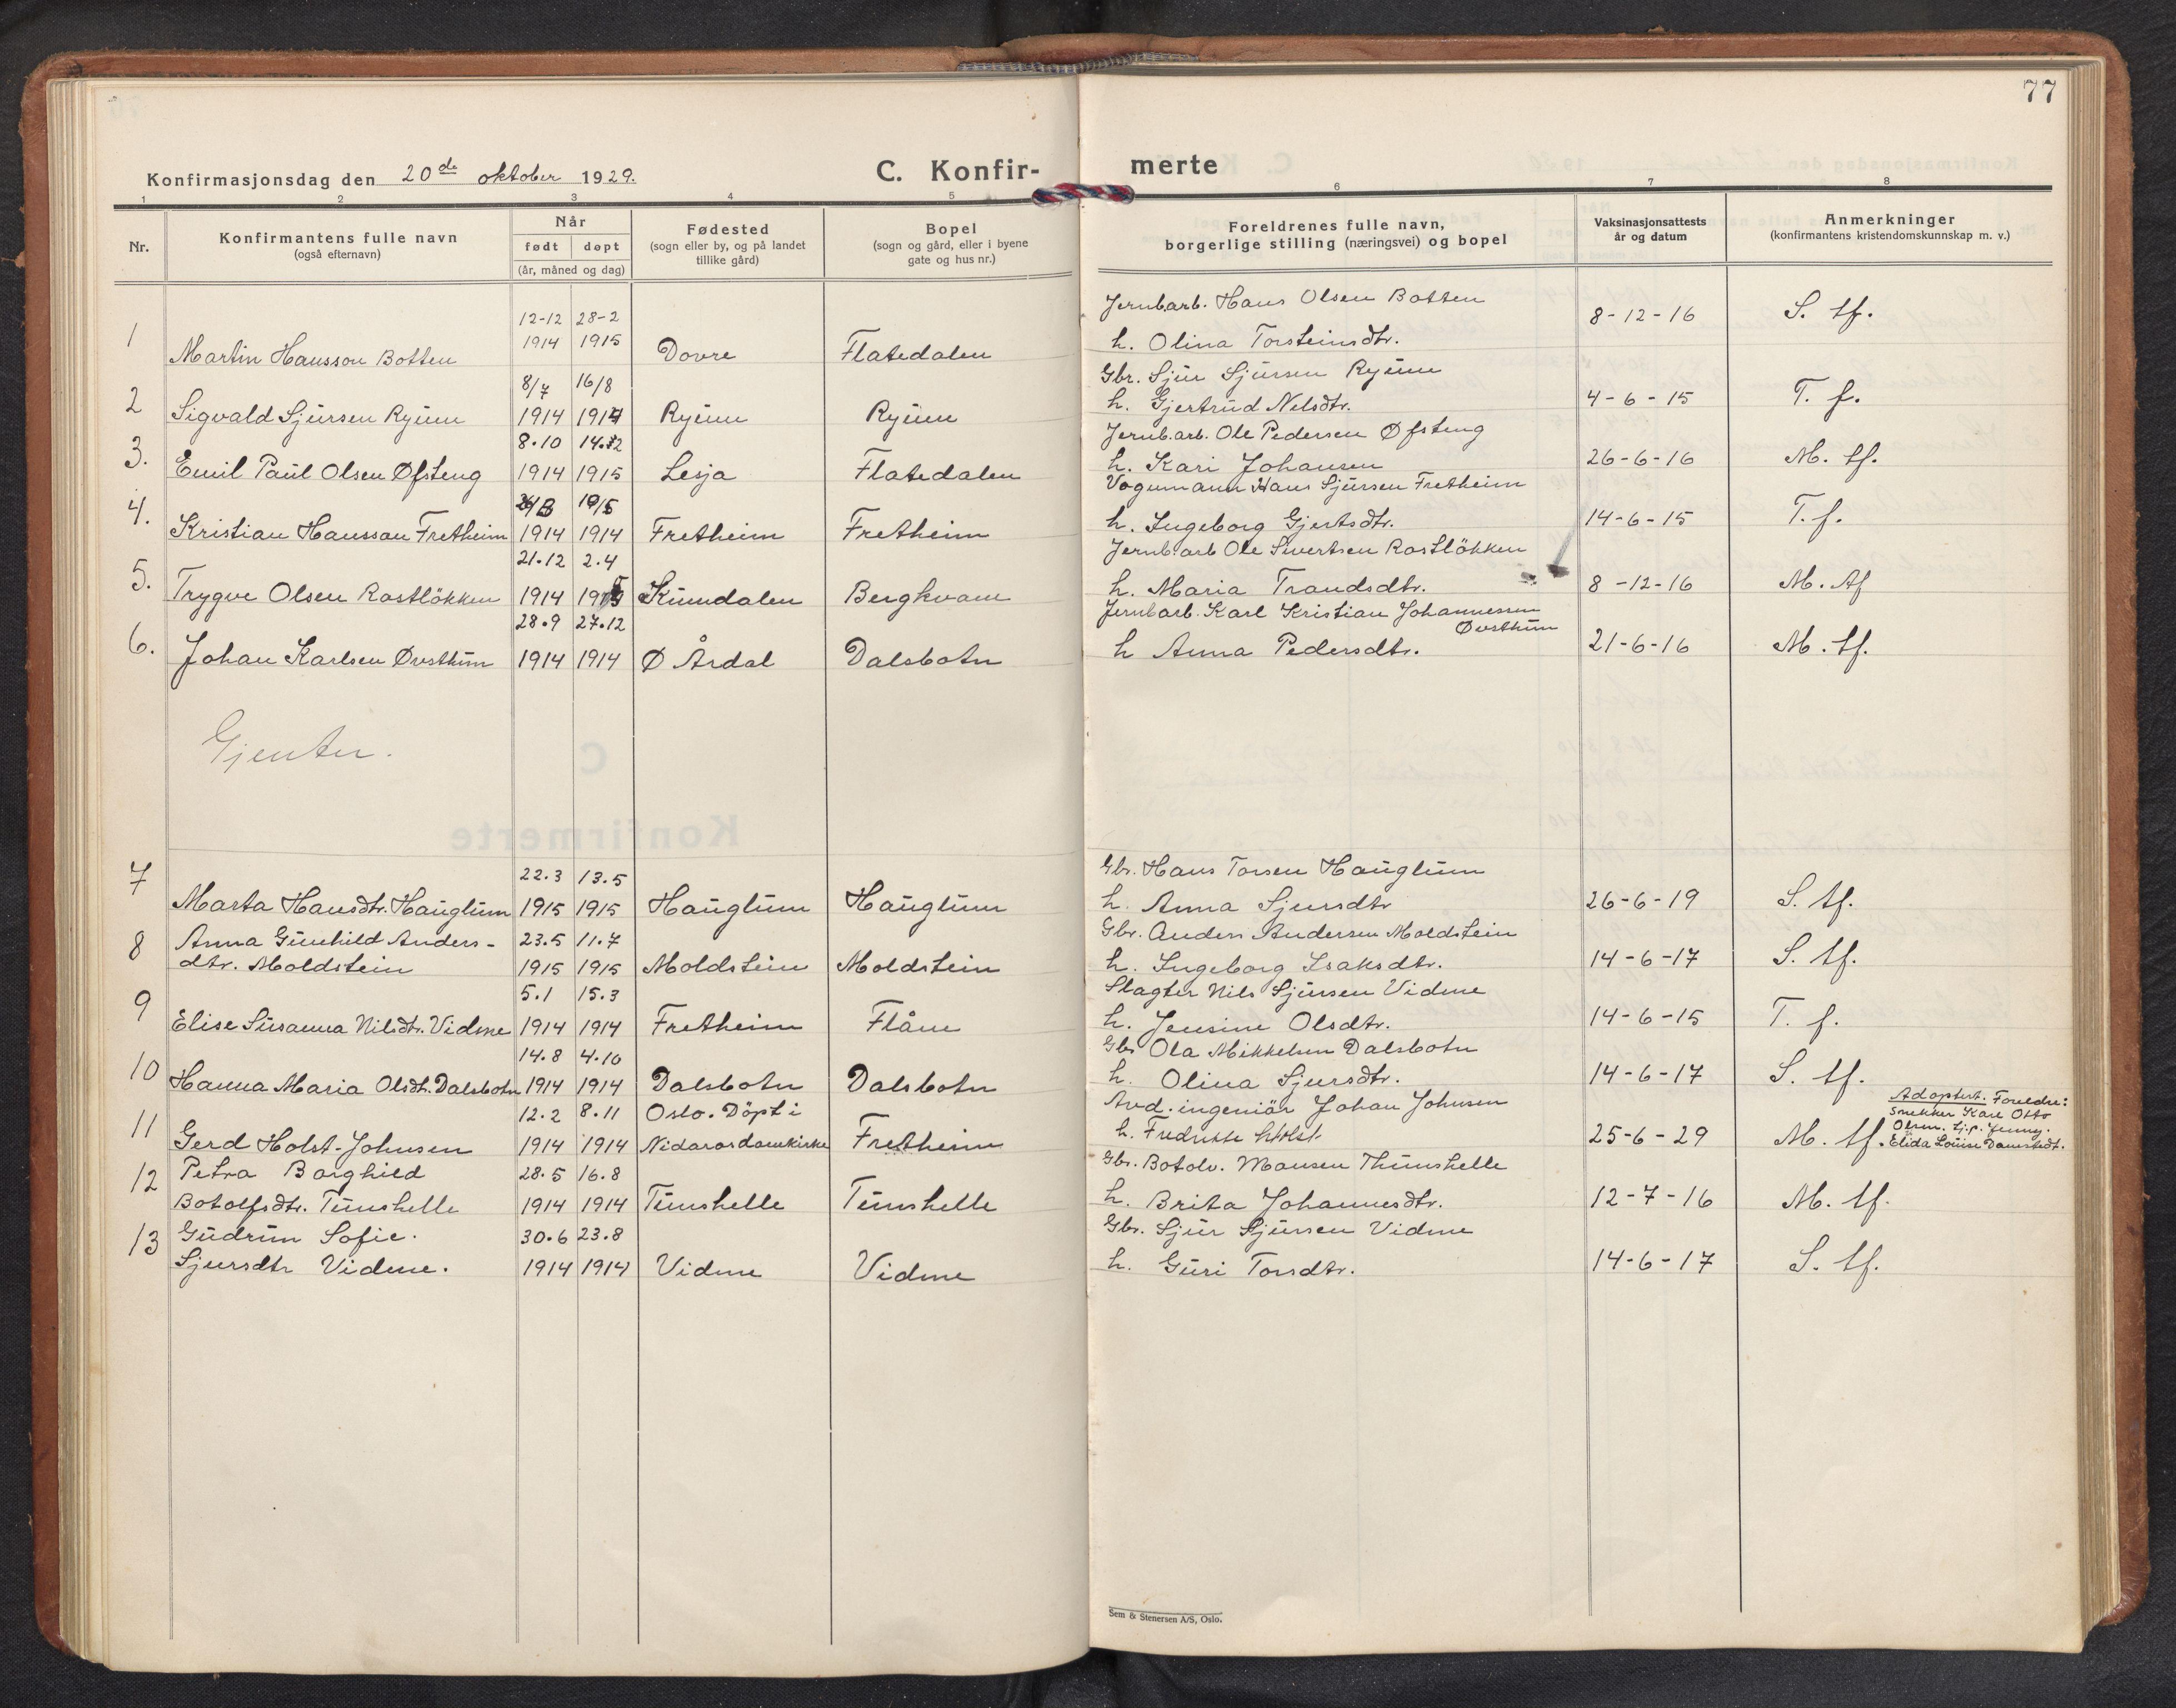 SAB, Aurland sokneprestembete, H/Hb/Hbb/L0003: Klokkerbok nr. B 3, 1929-1972, s. 76b-77a